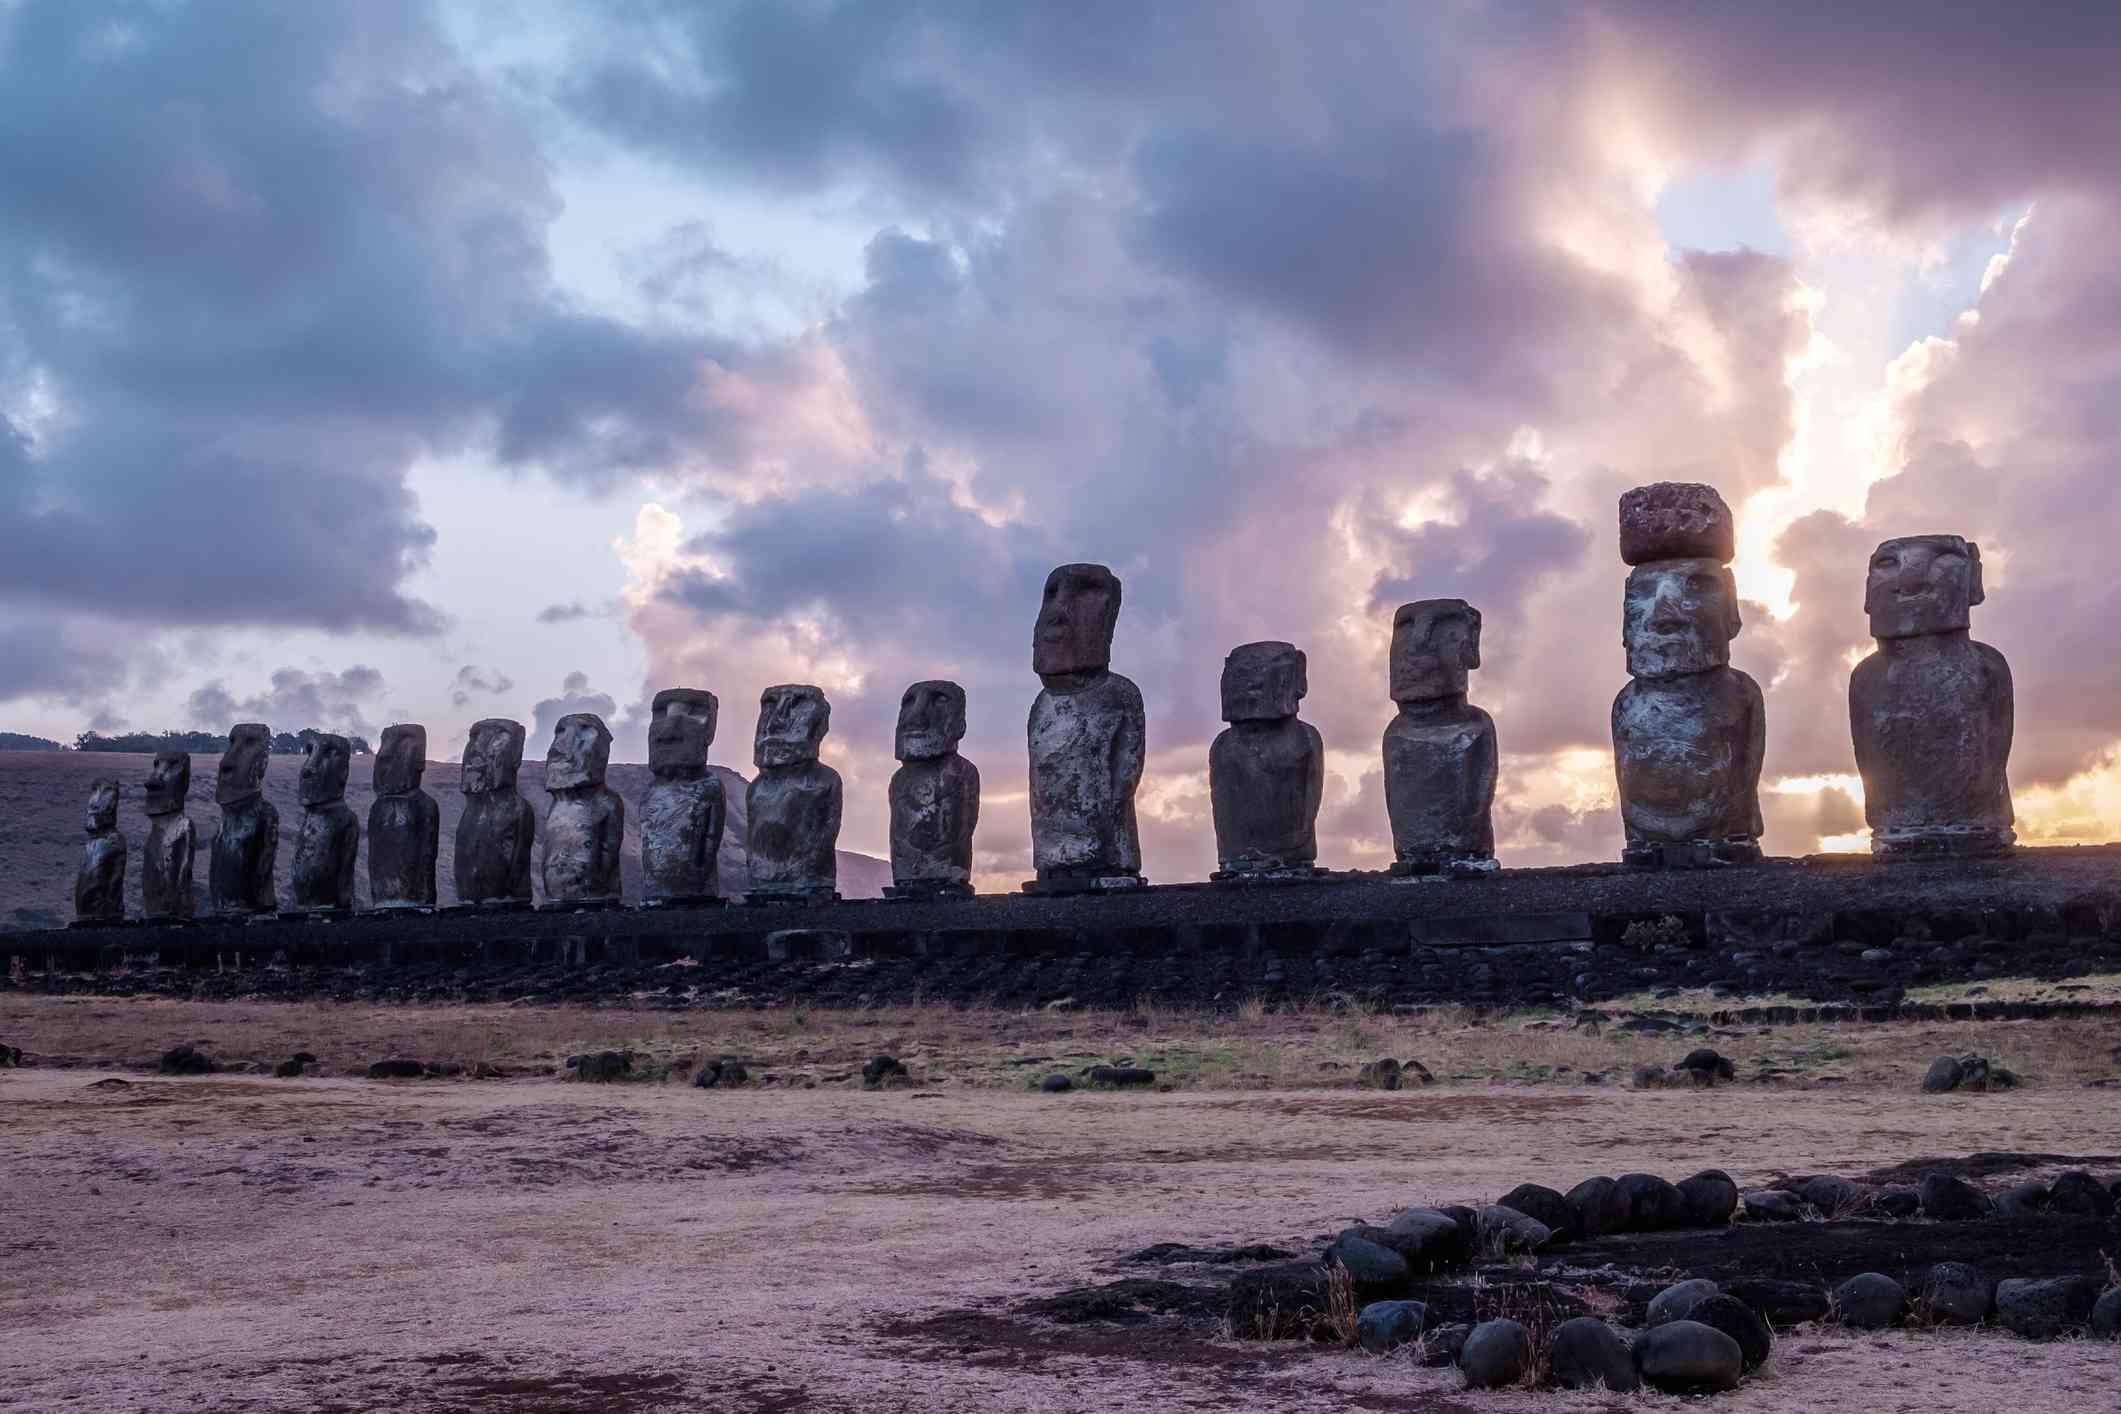 Moai statues against a cloudy sky at sunrise.